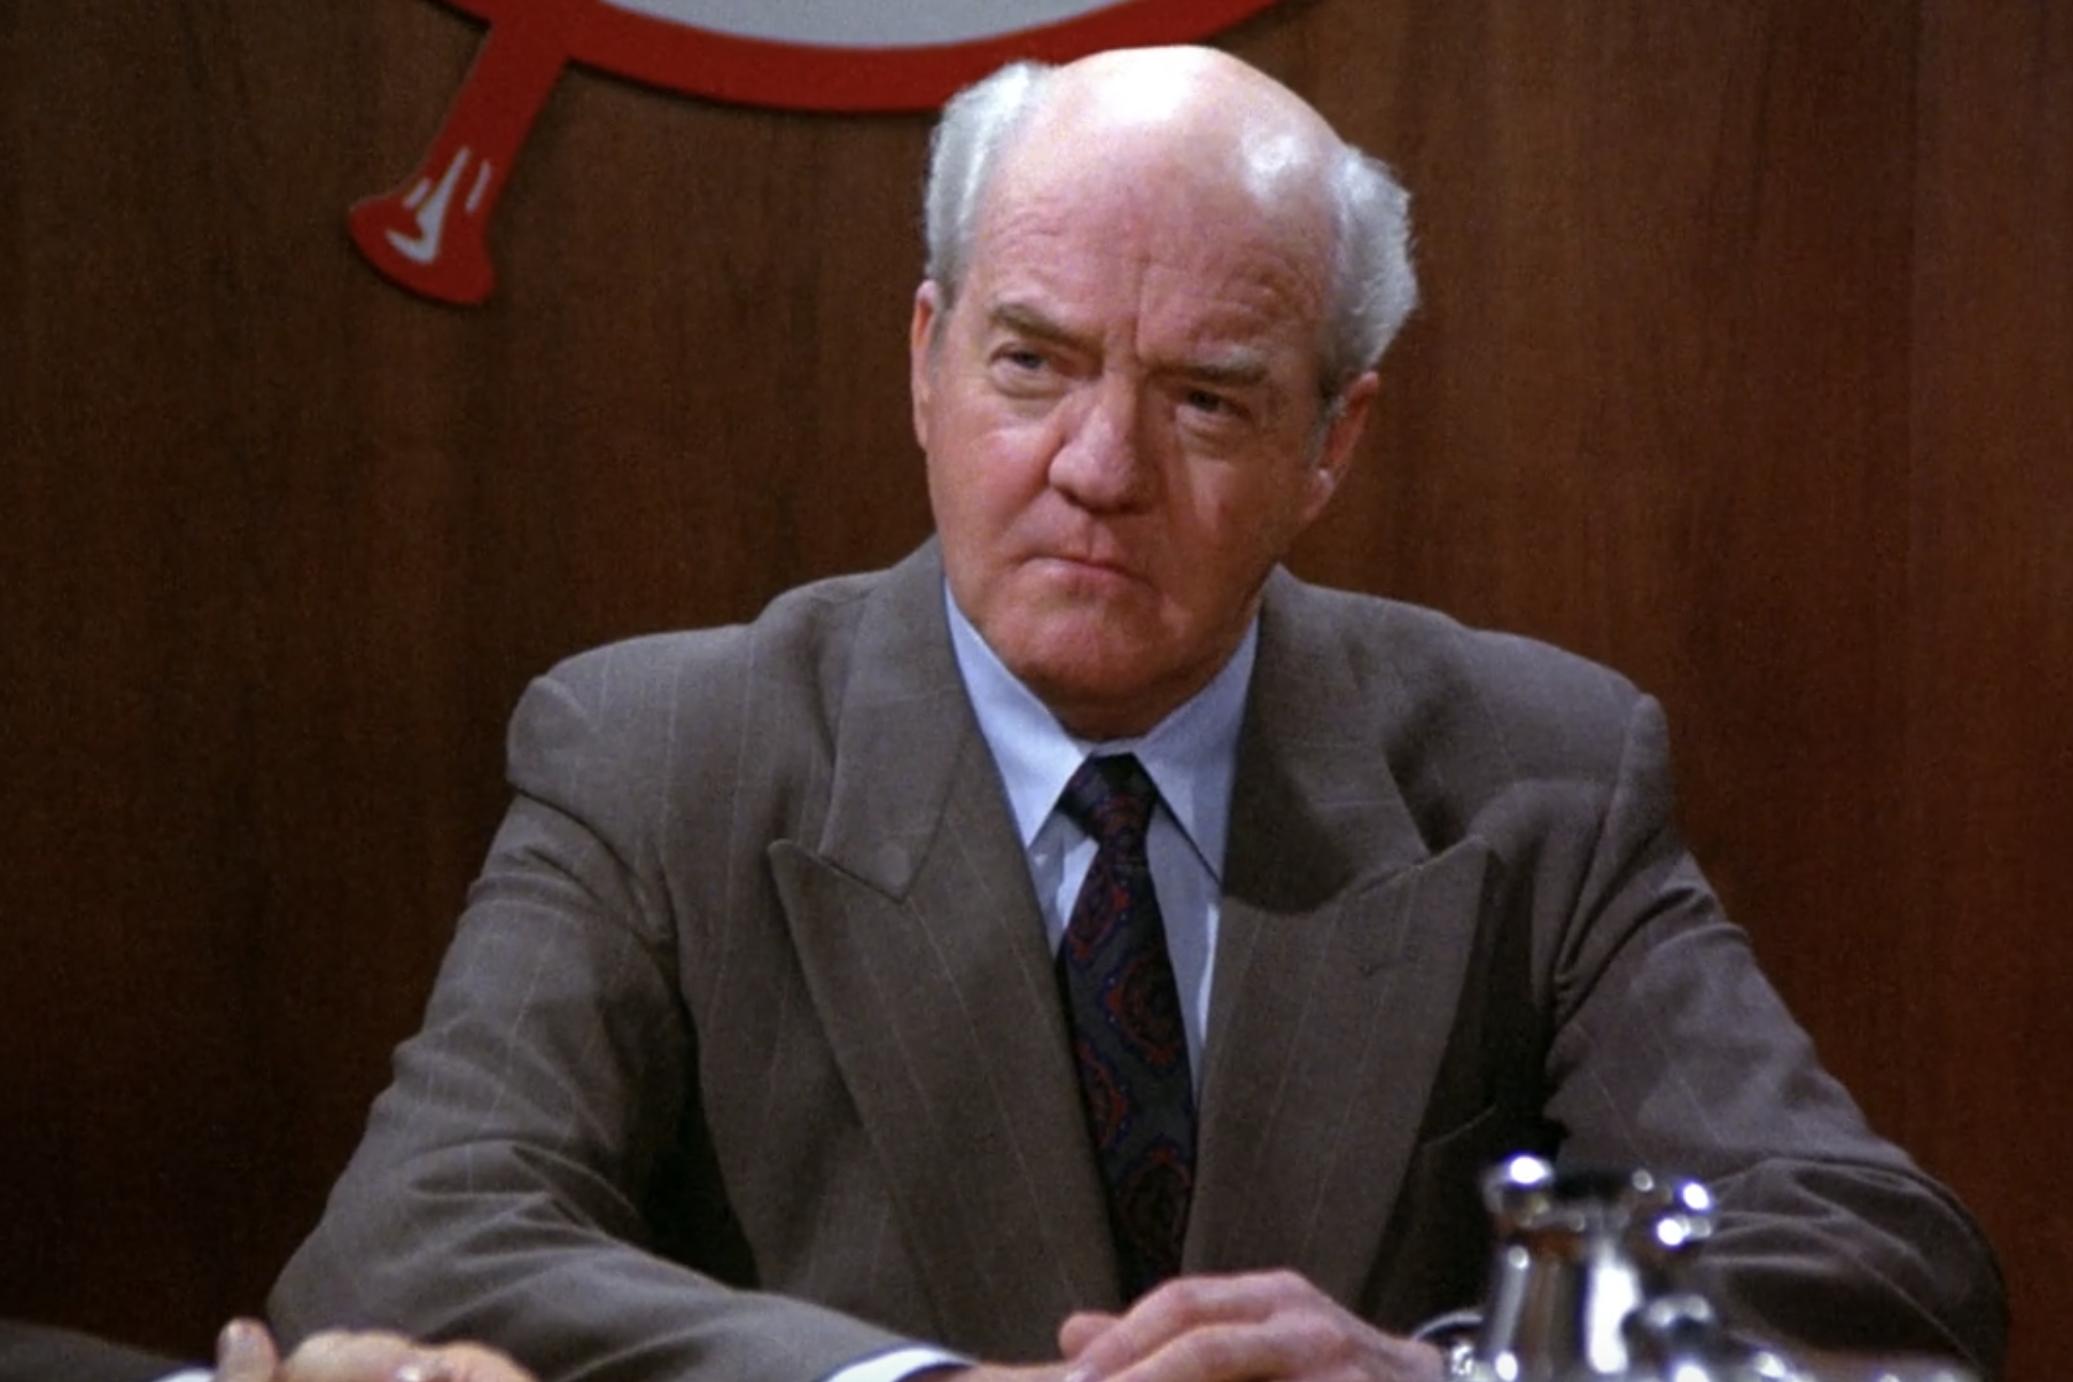 Richard Herd death: Actor who played Mr Wilhelm on 'Seinfeld' dies aged 87